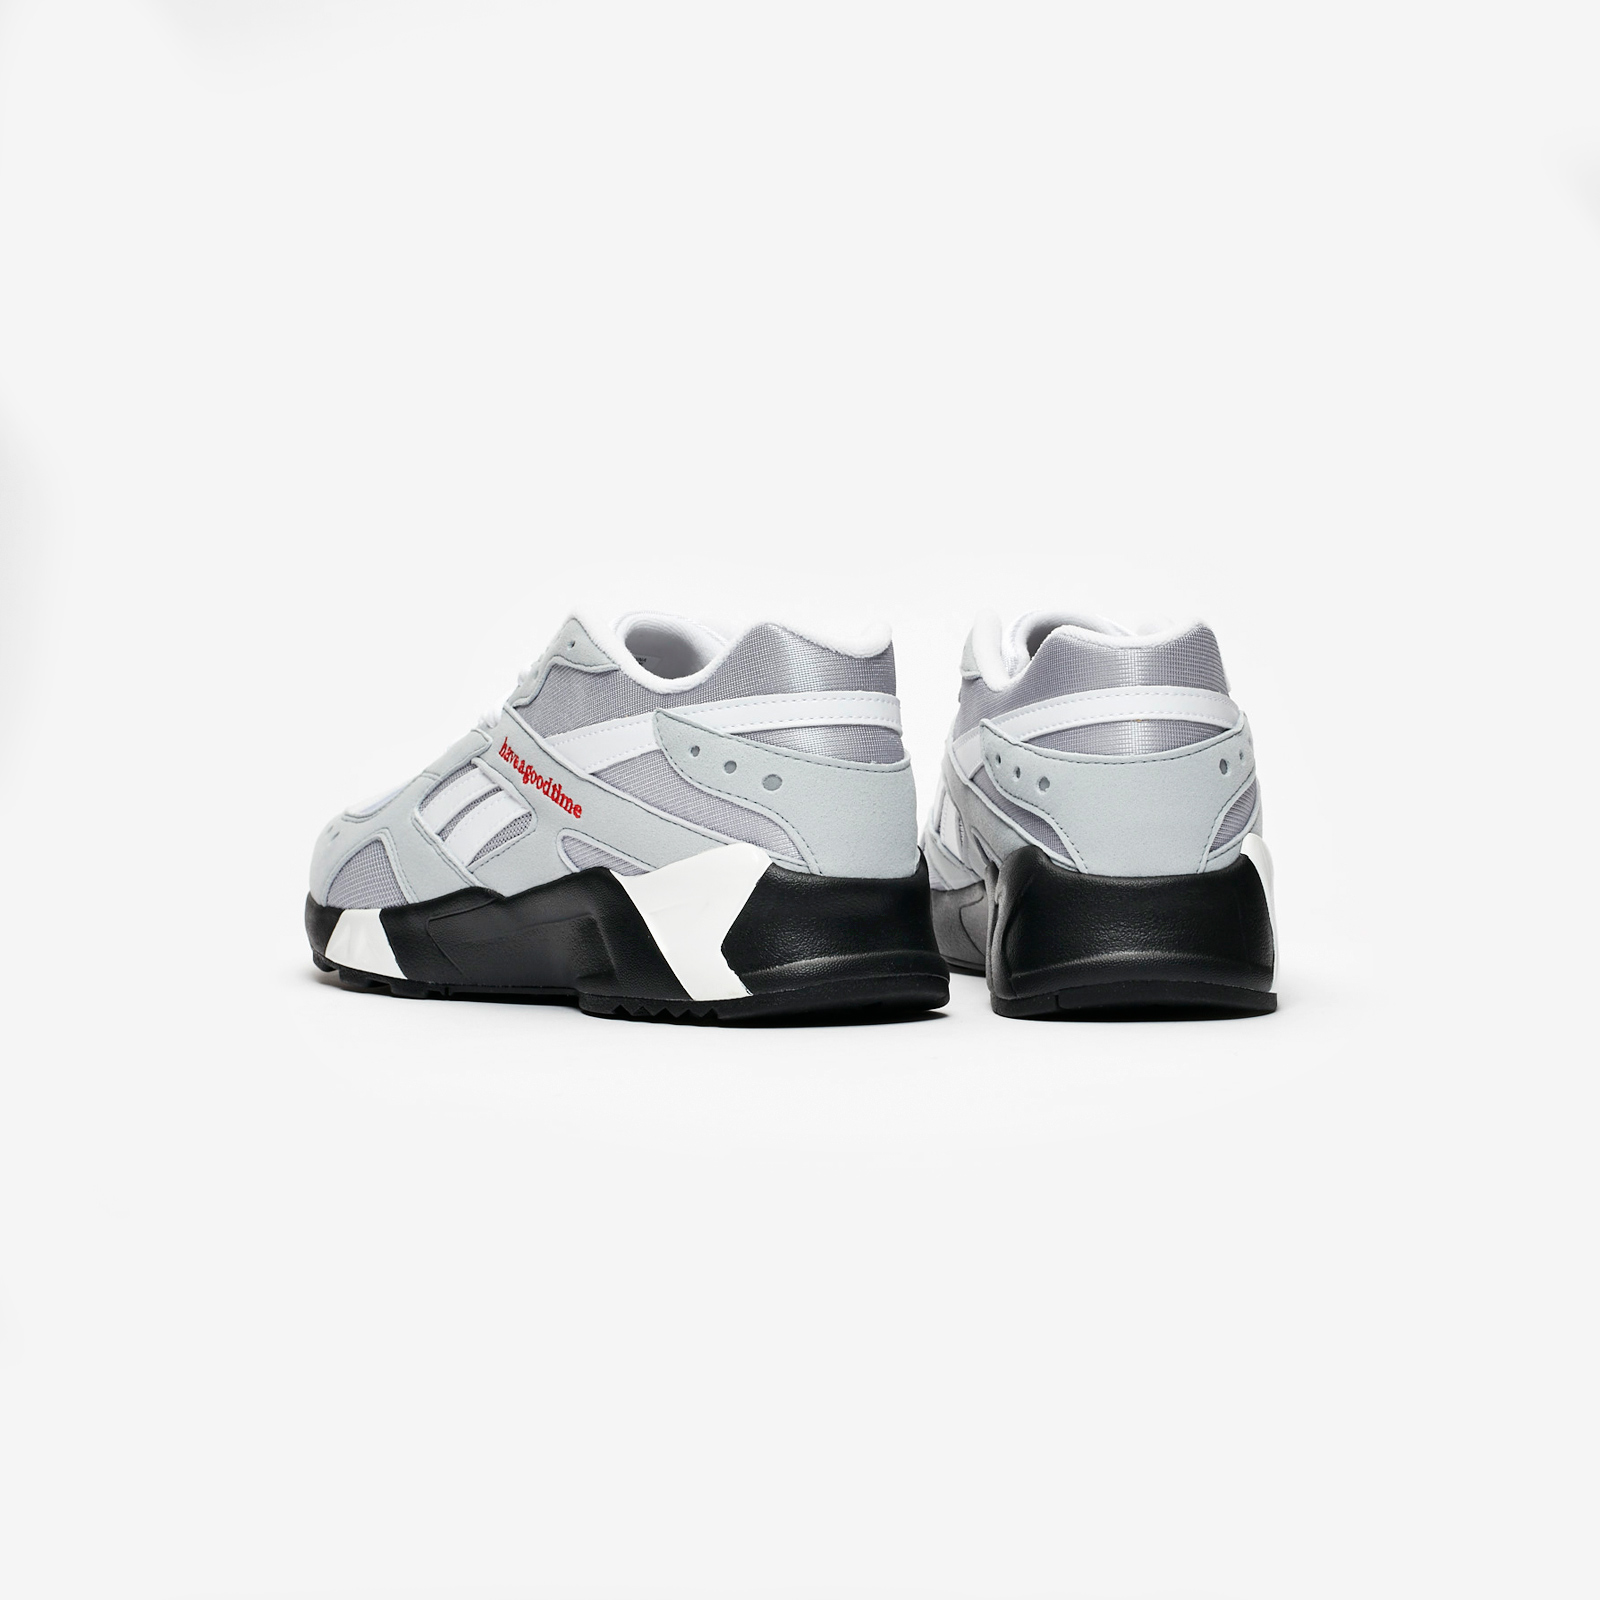 Reebok Aztrek - Dv6436 - Sneakersnstuff